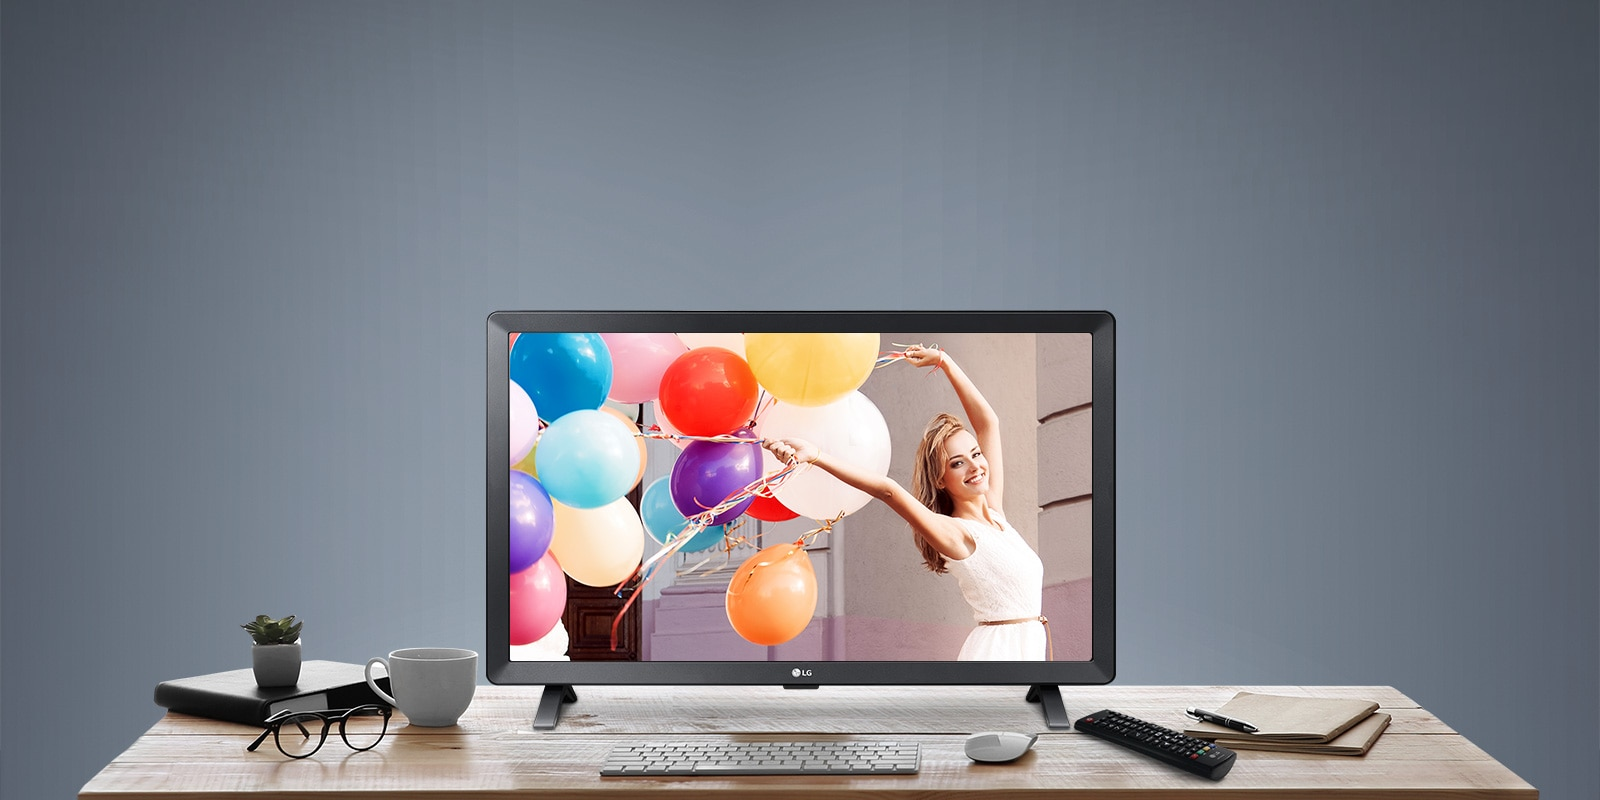 MNT-24TL520S-2019-Feature-01-LG-TV-Monitor-Desktop